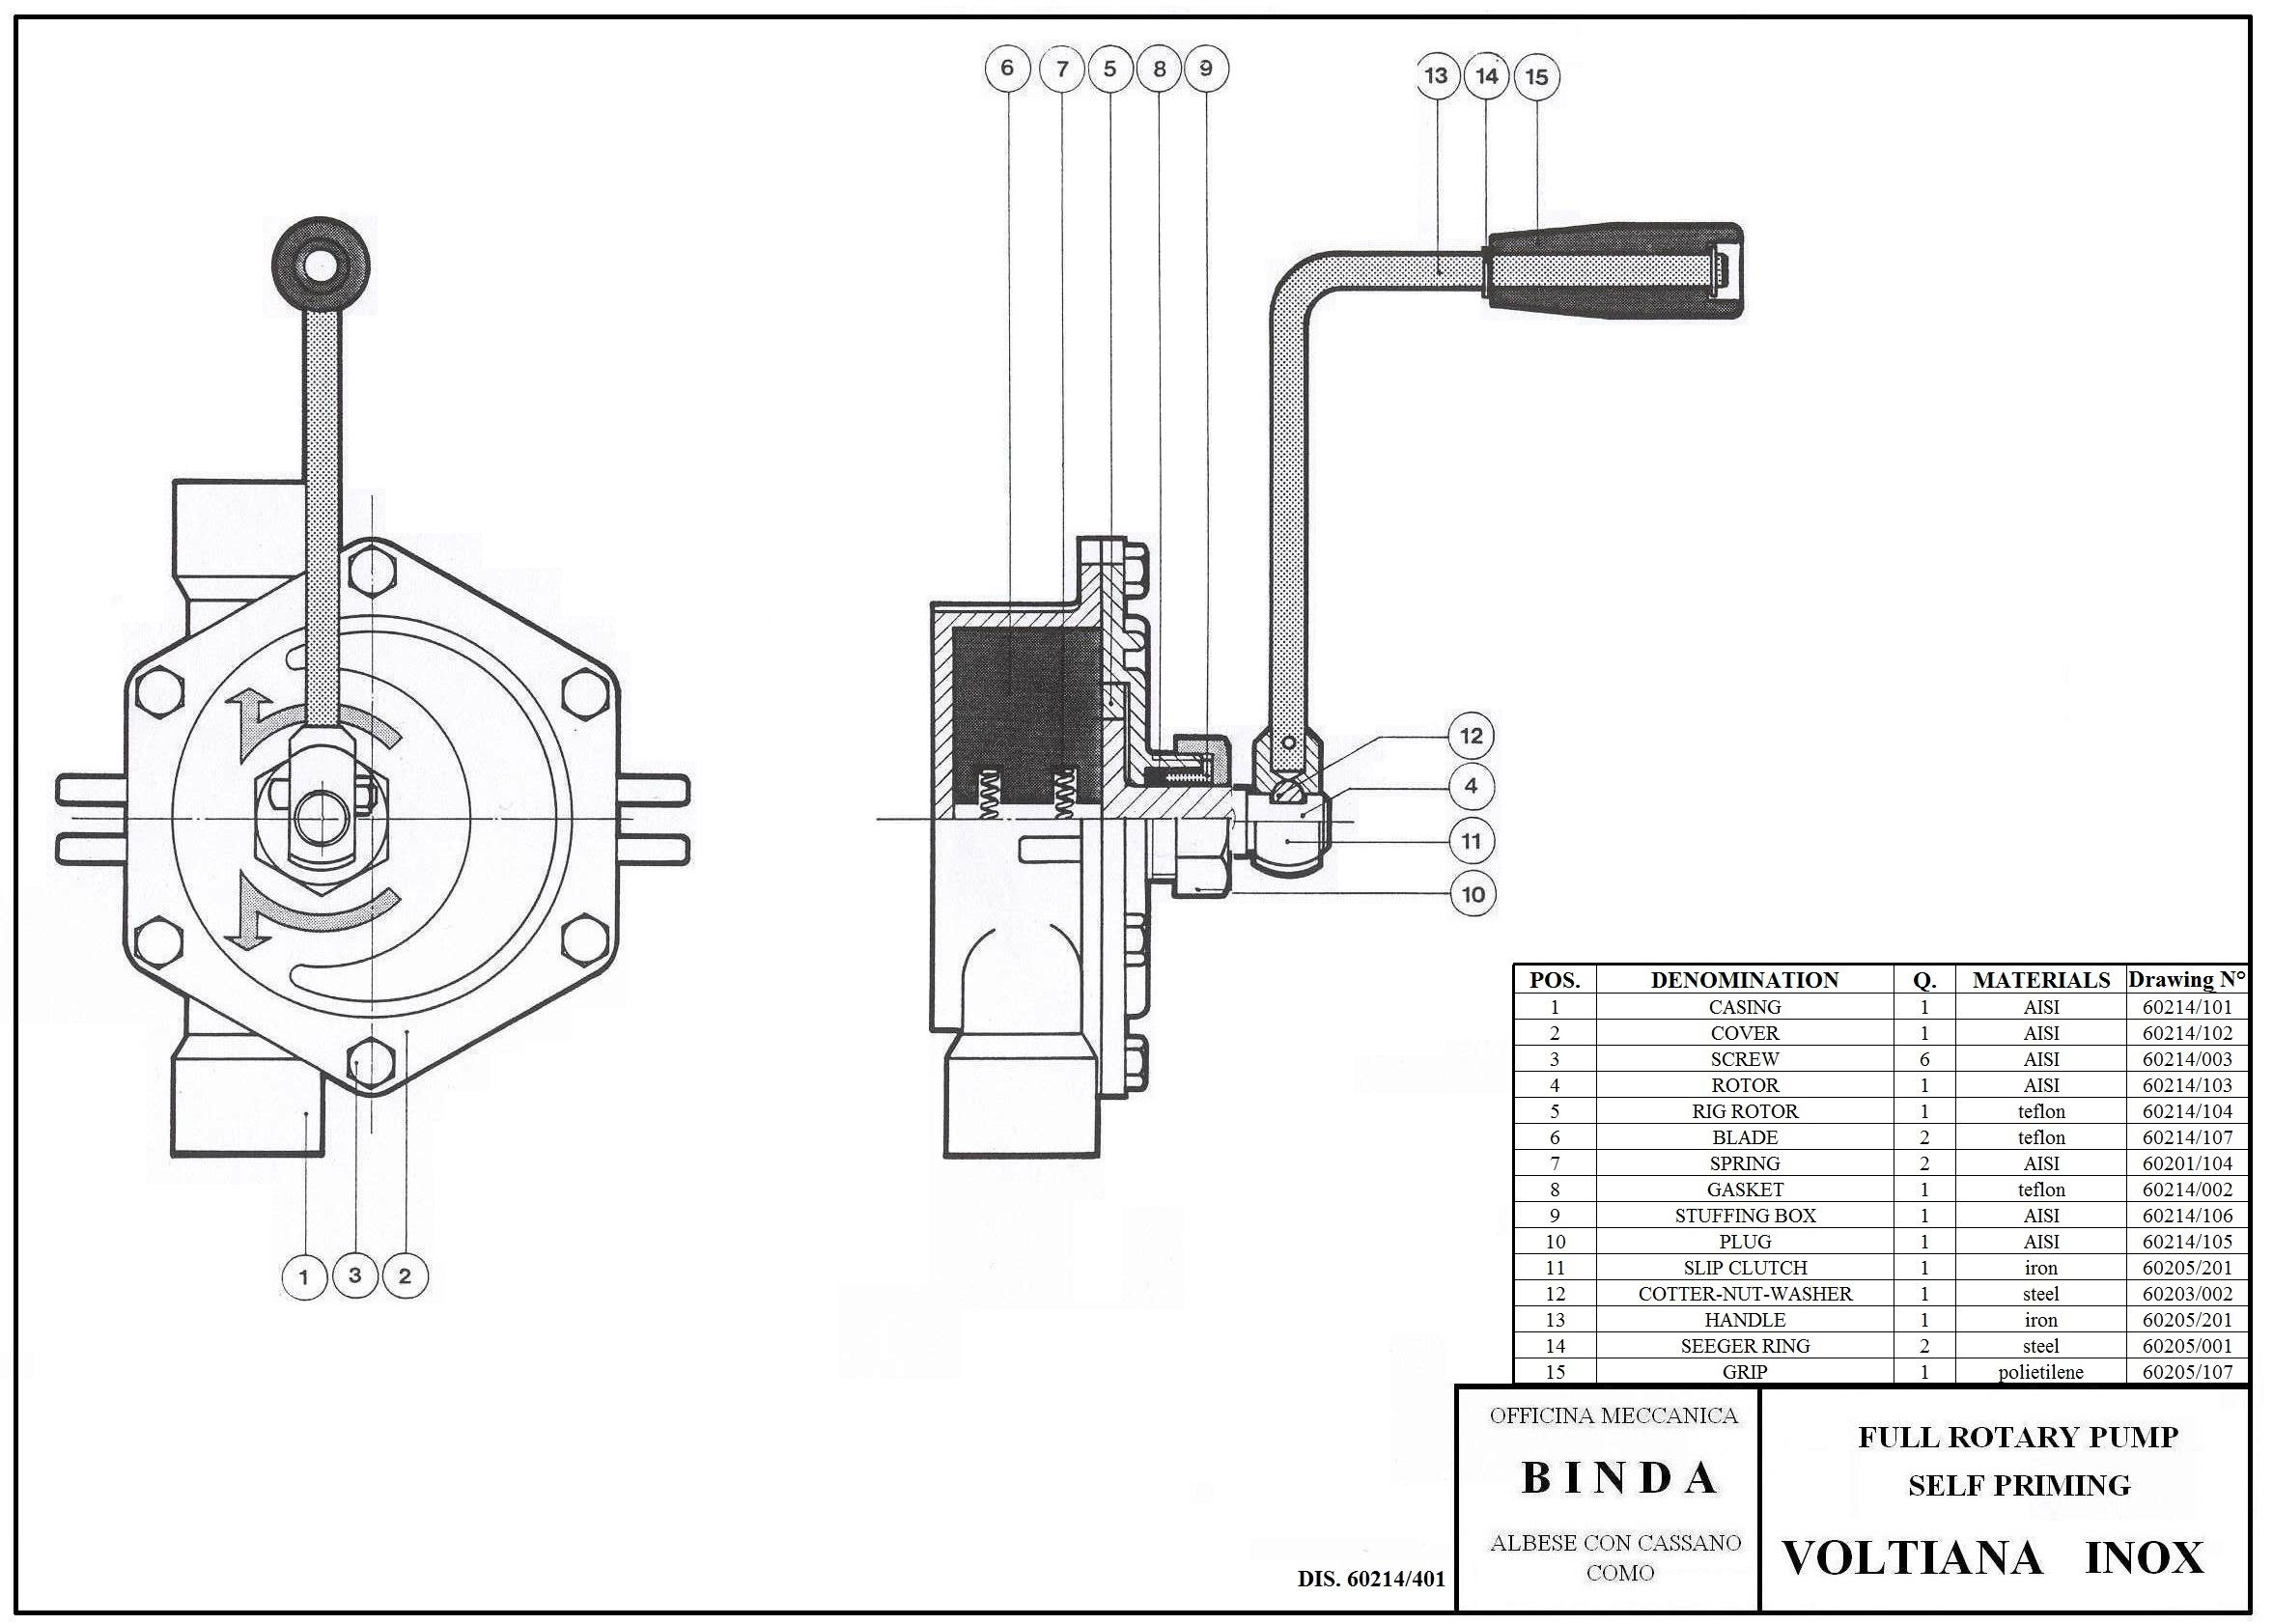 binda voltiana inox rotary hand pump  u0026 manual pump